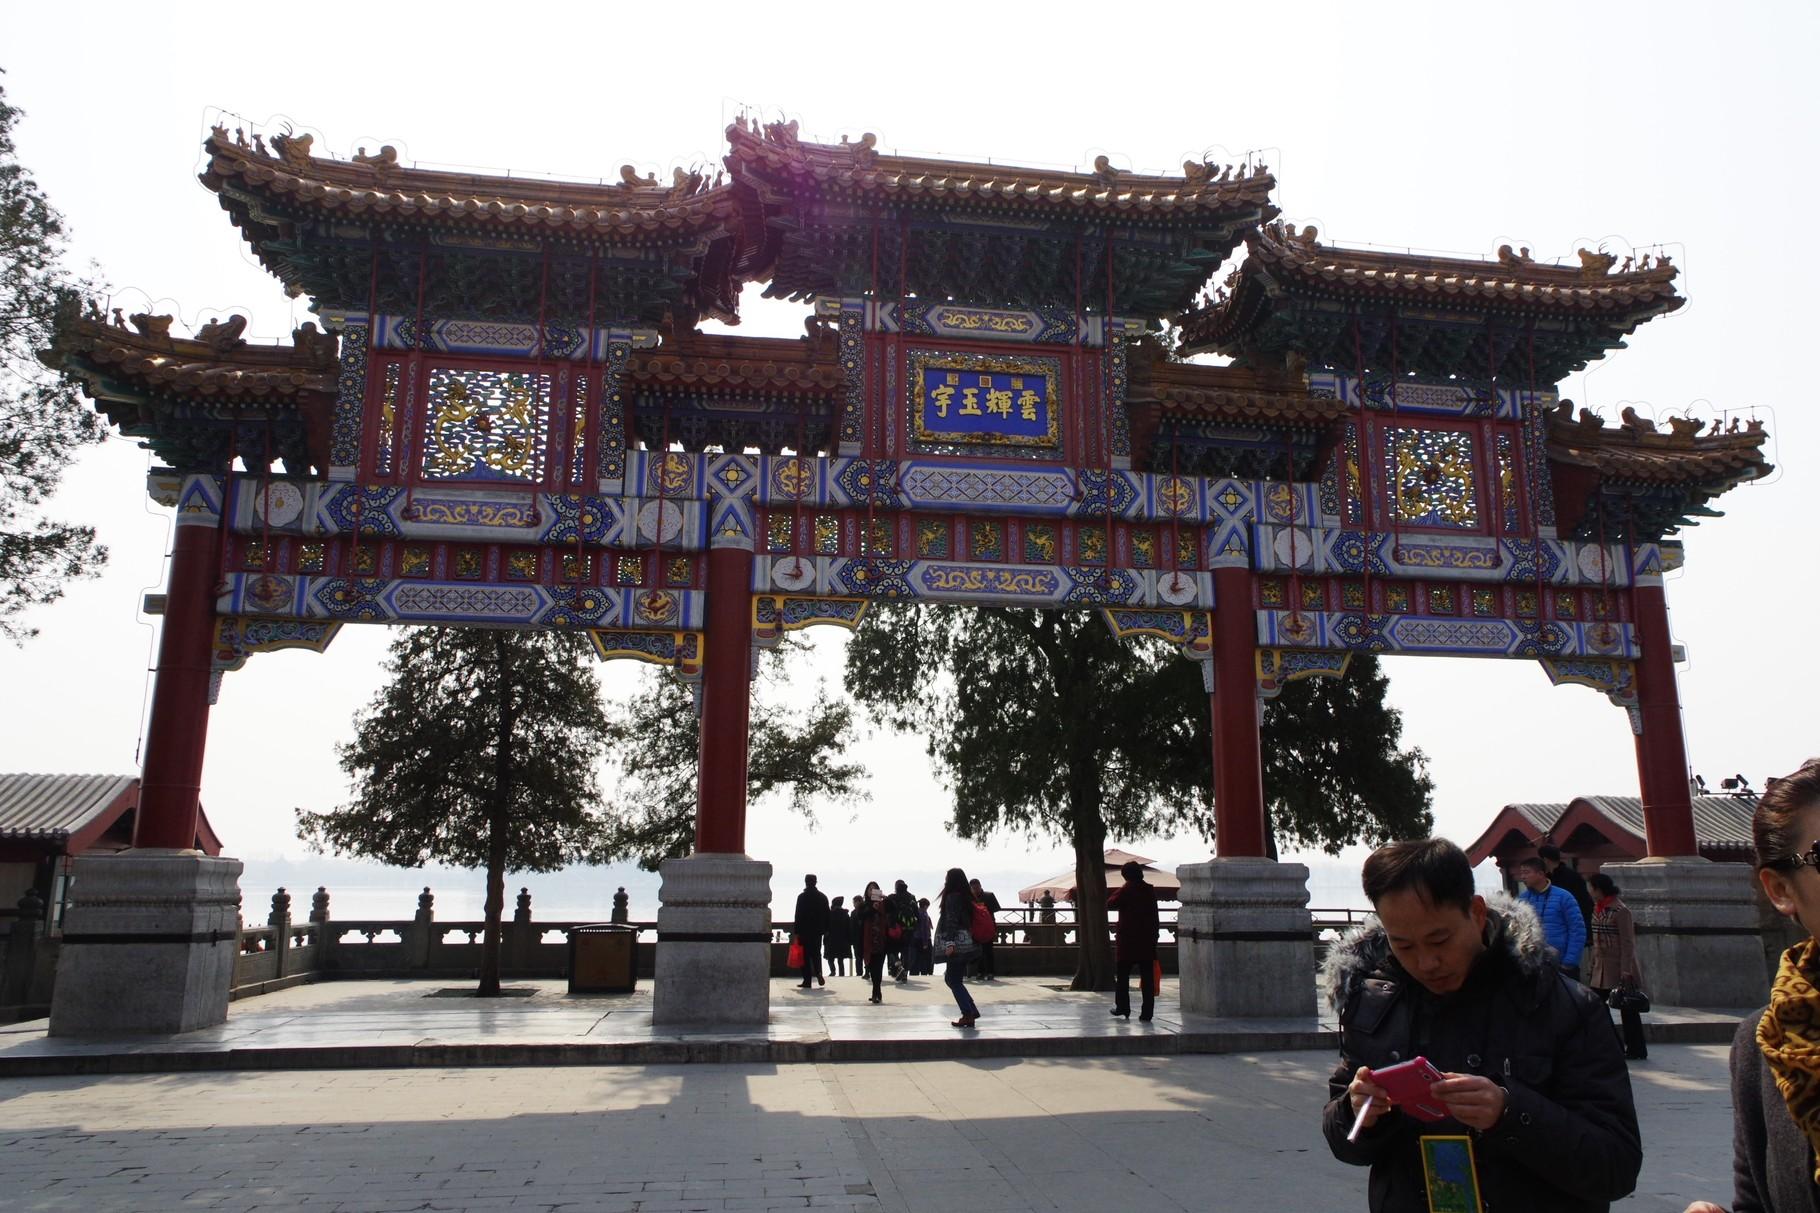 仏香閣正面の牌楼